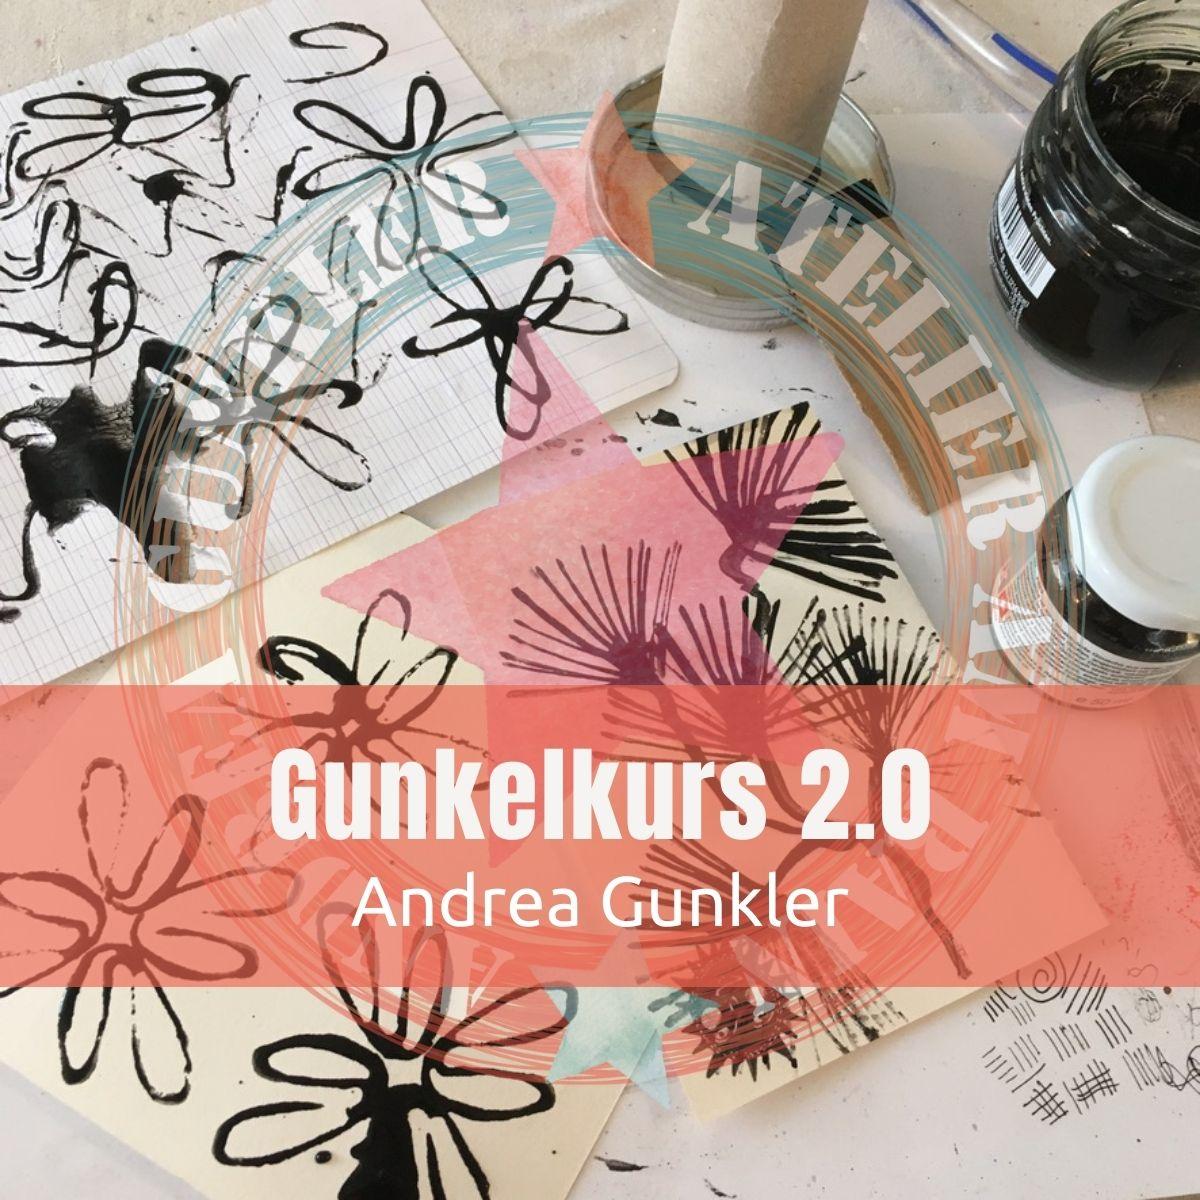 Gunkelkurs 2.0 mit Andrea Gunkler